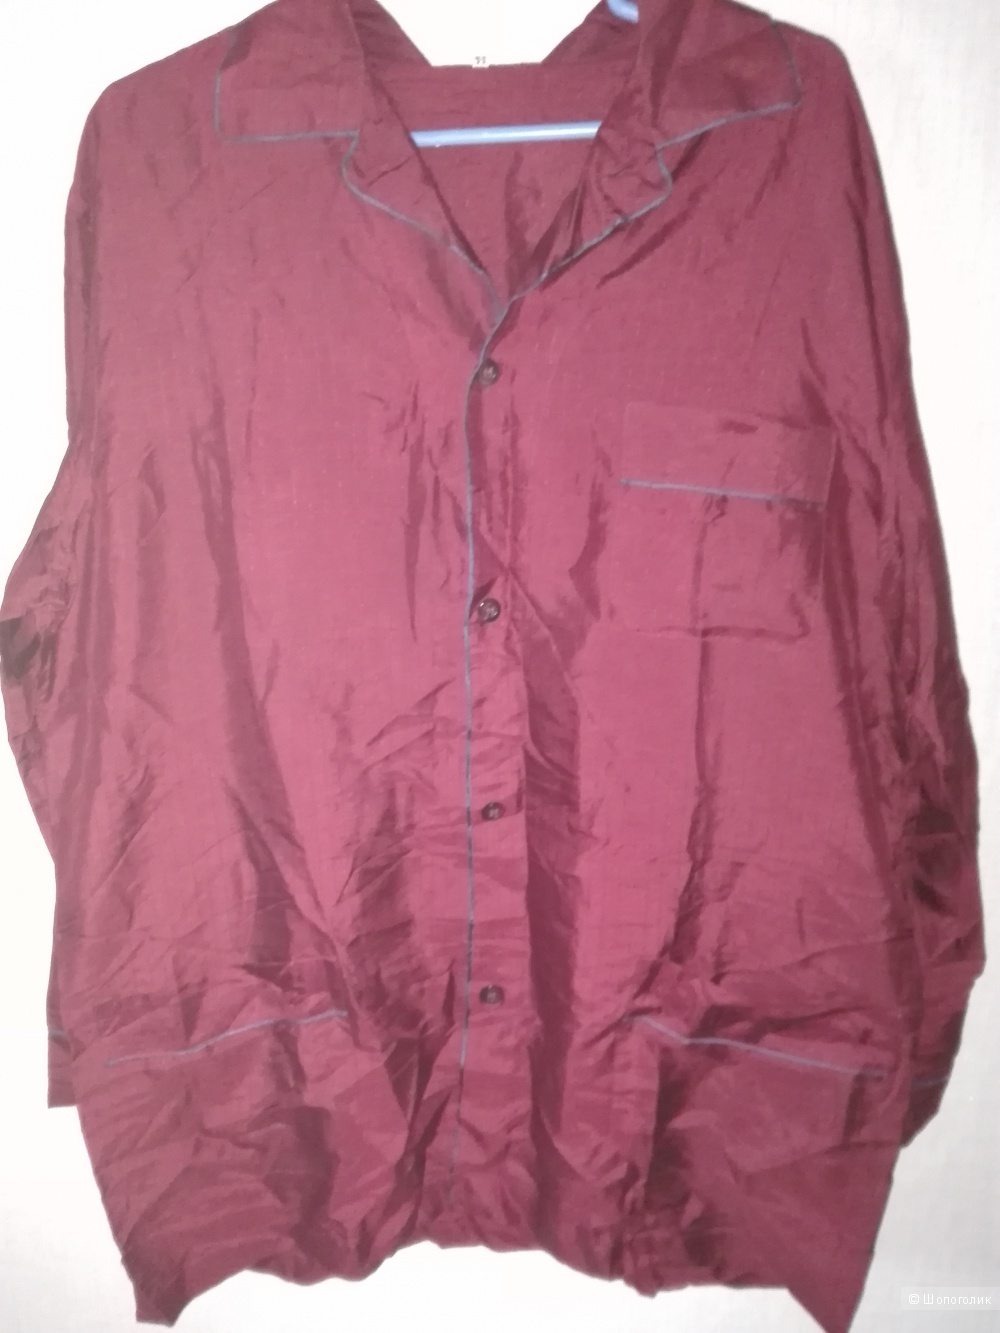 Пижама шелк, мужская р-р 50 (италия)